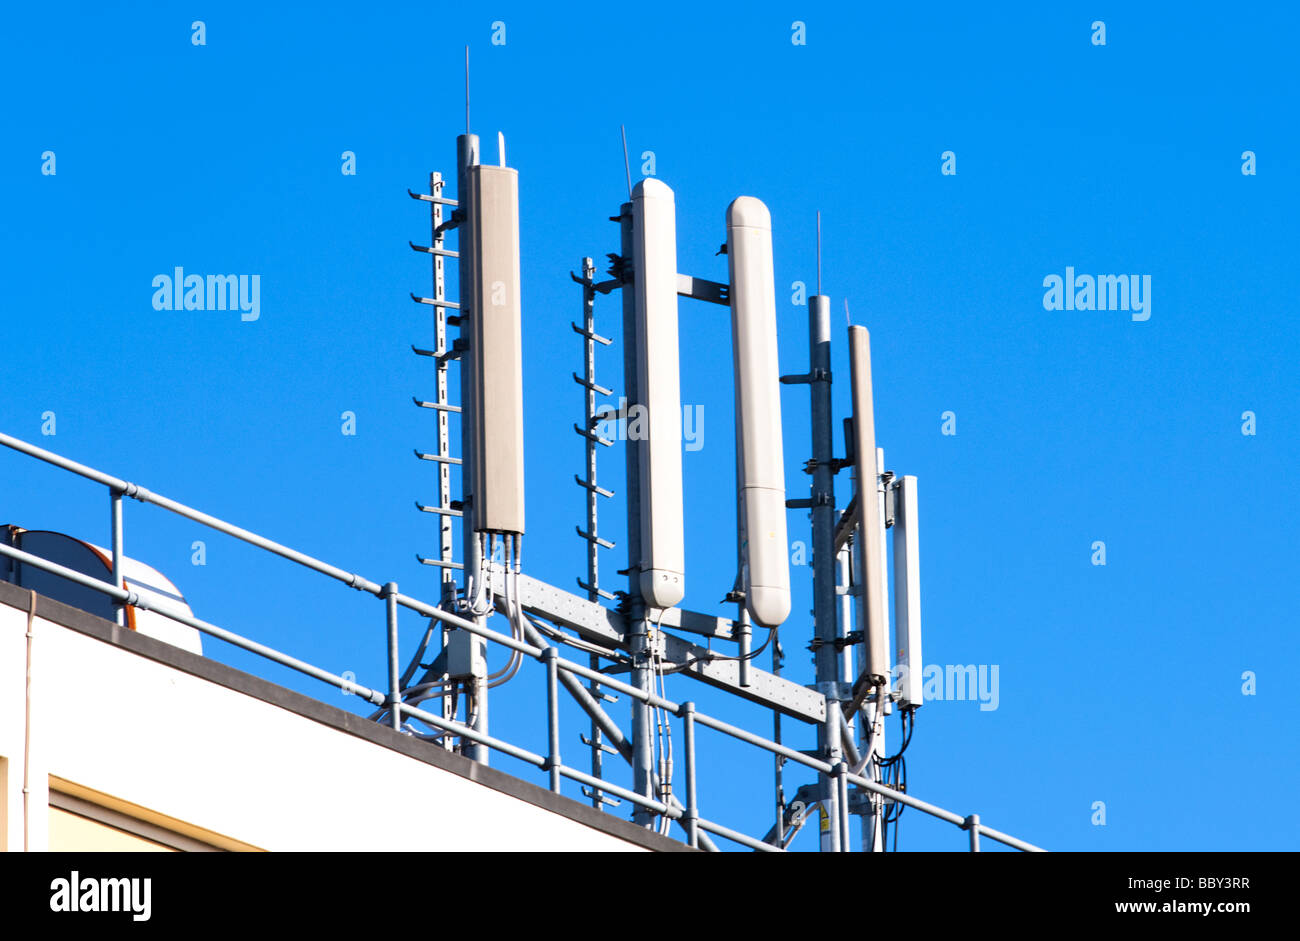 Mobile phone mast, BT Exchange, Leamington Spa, Warwickshire, UK. - Stock Image